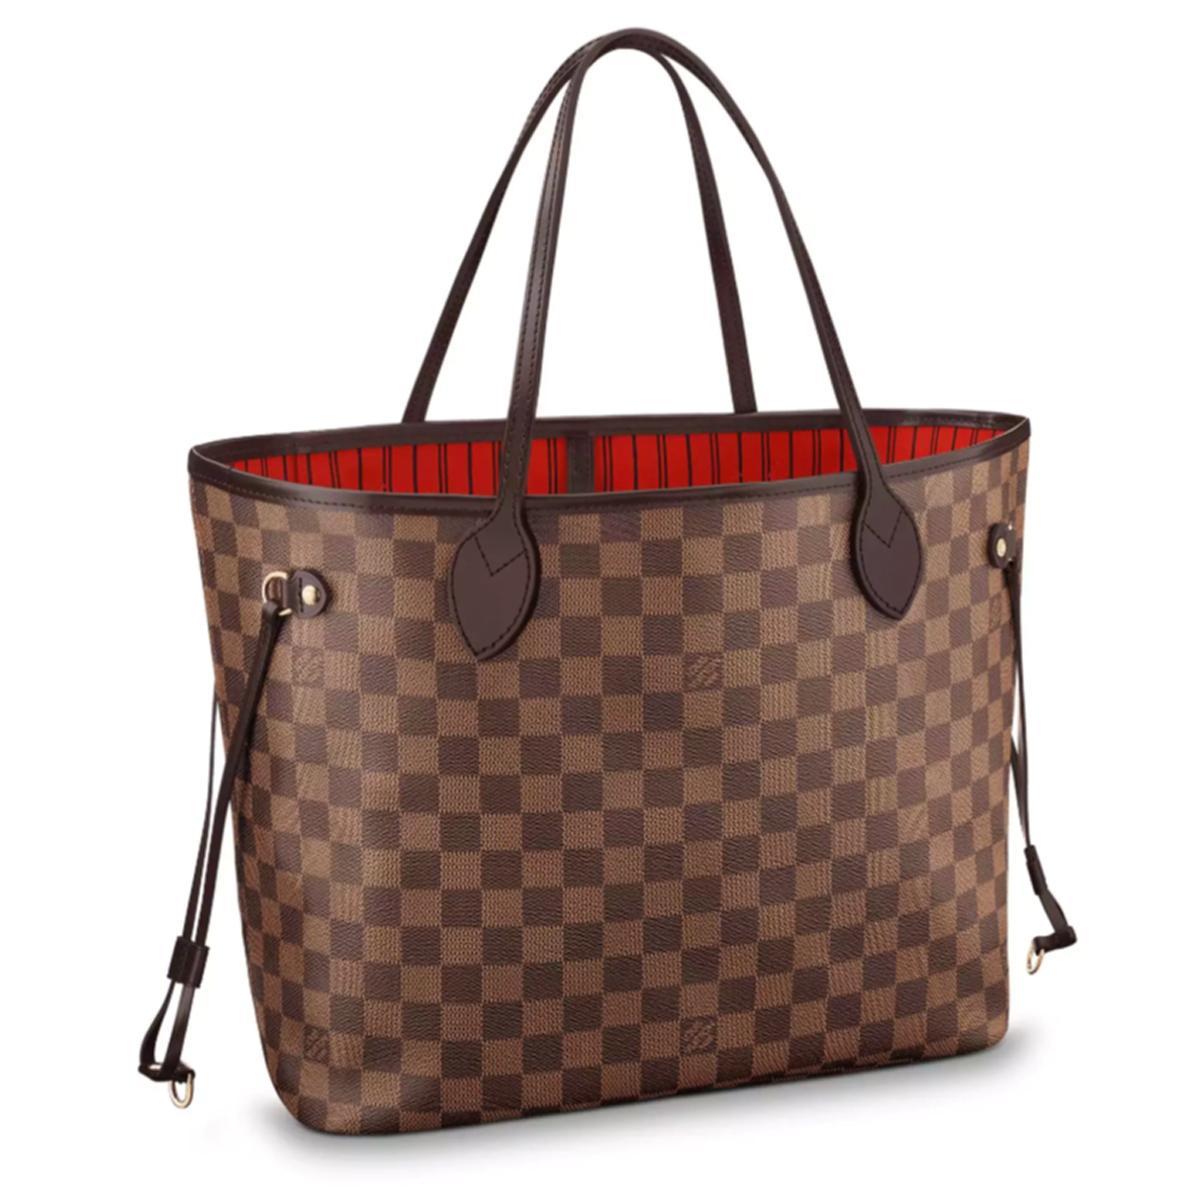 classic-designer-handbag-brands-271996-1541601318879-product.1200x0c.jpg (1200×1200)